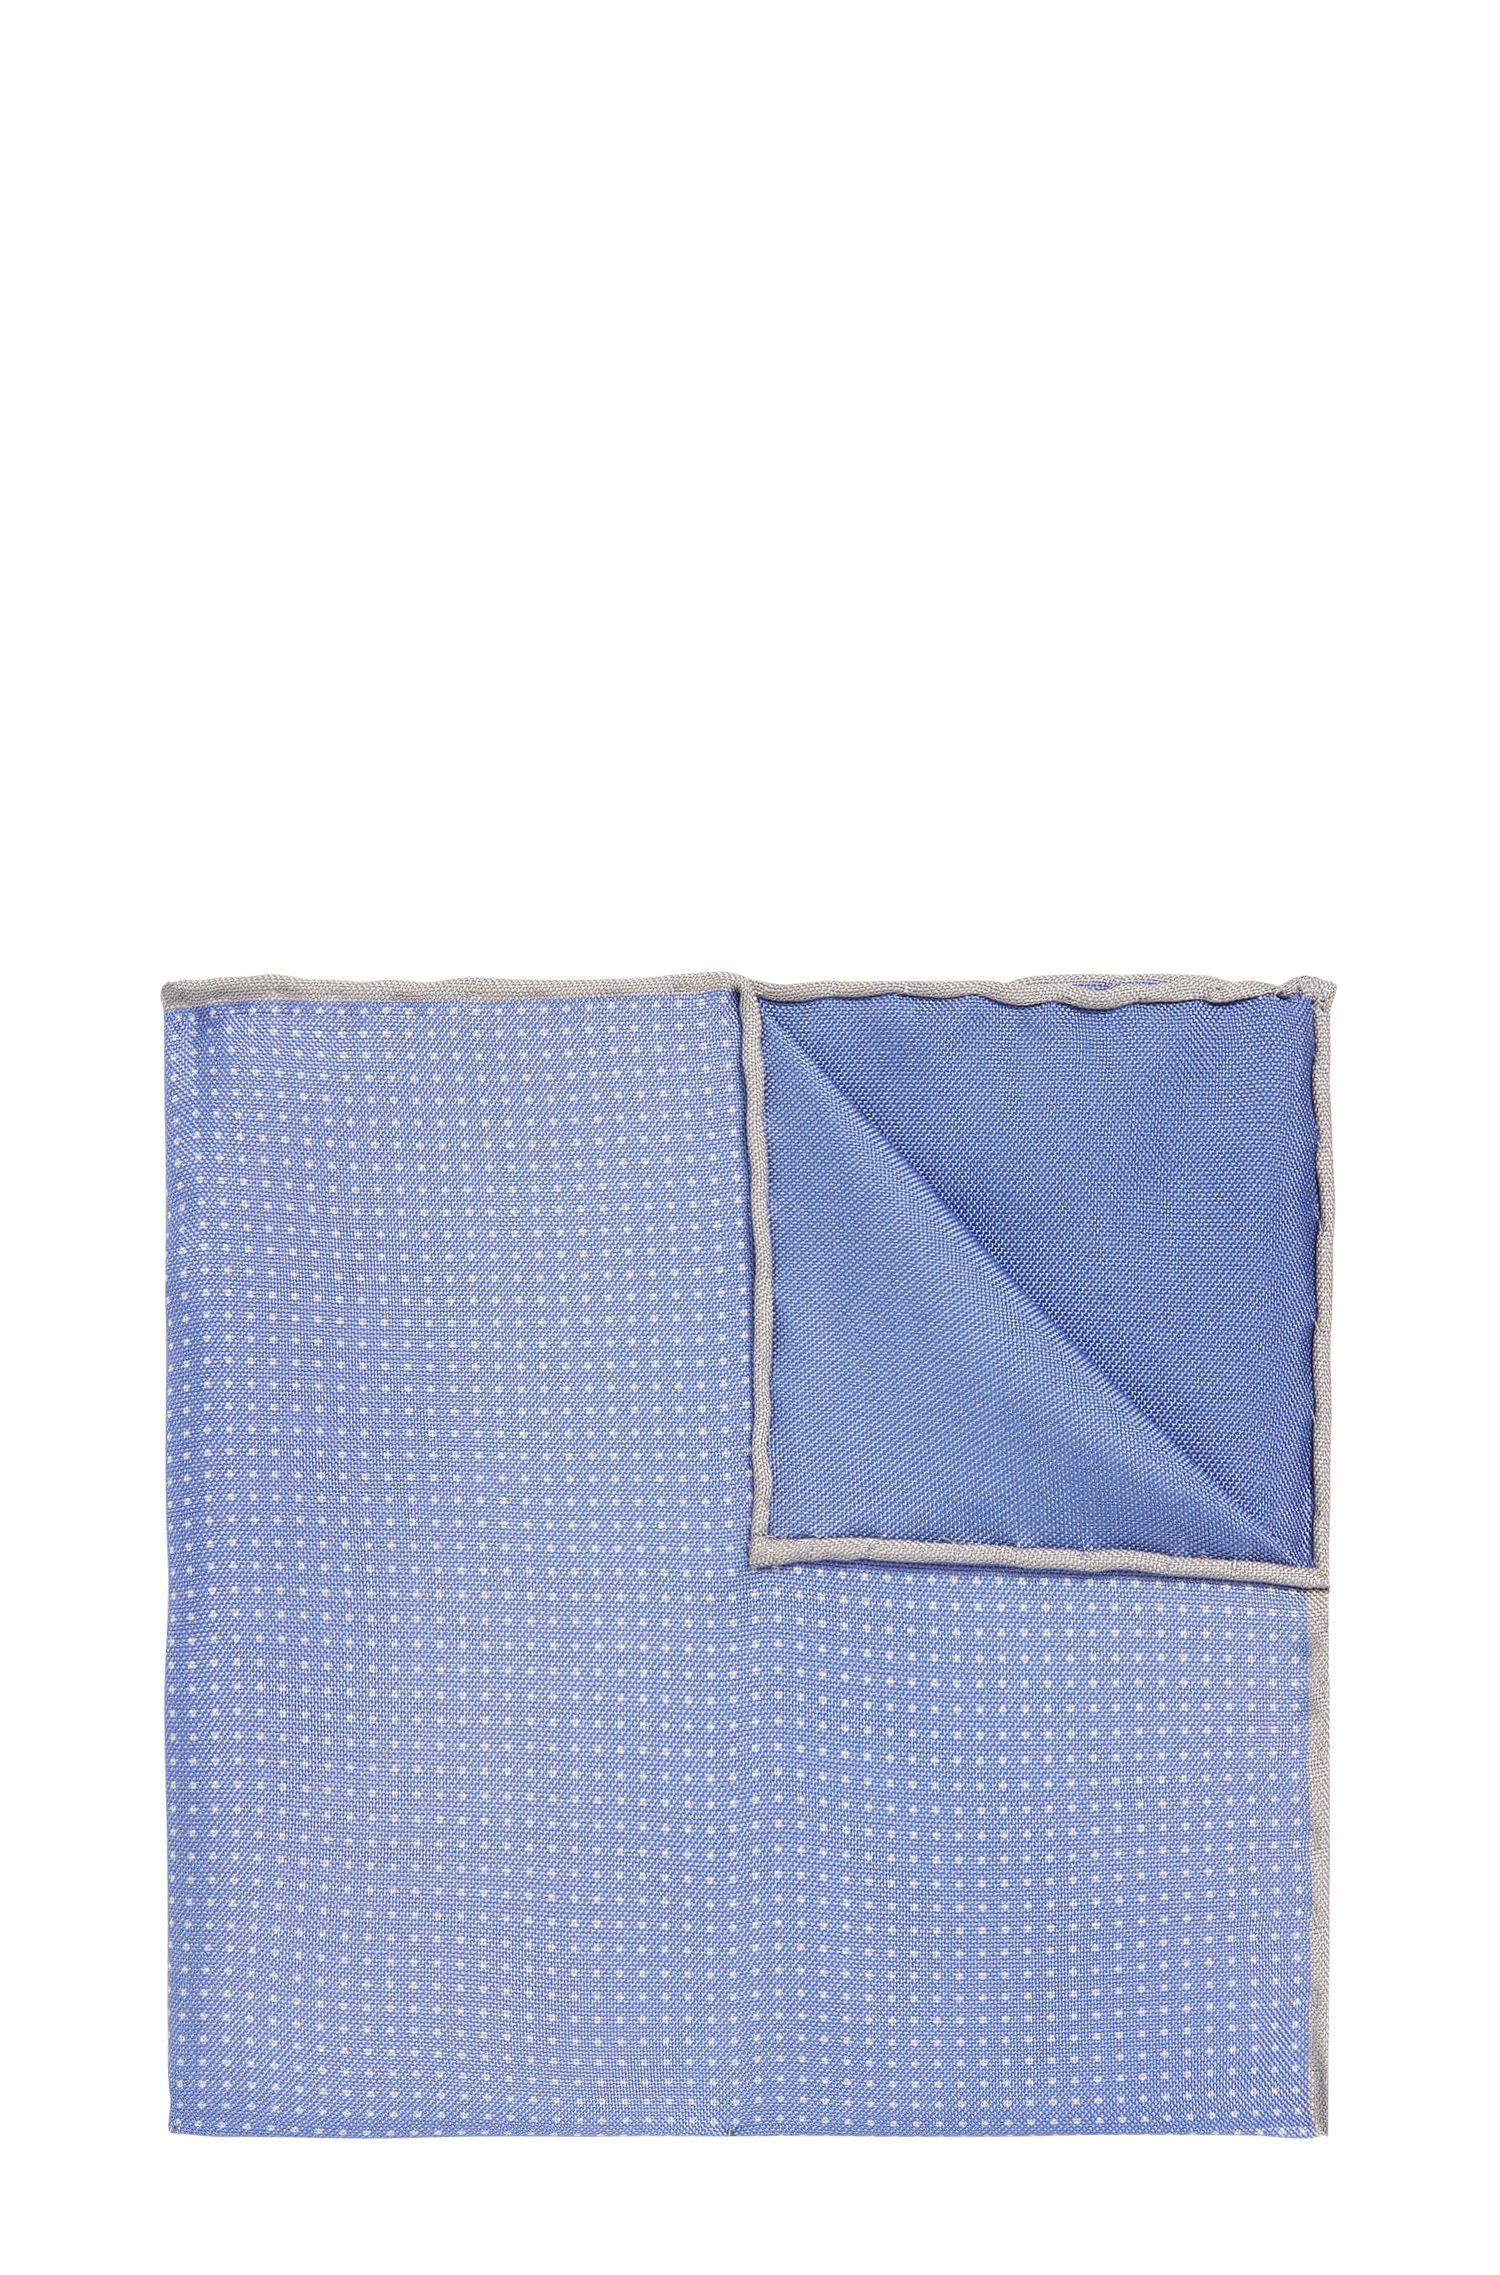 'T-Pocket sq. cm 33x33' | Italian Silk Pocket Square